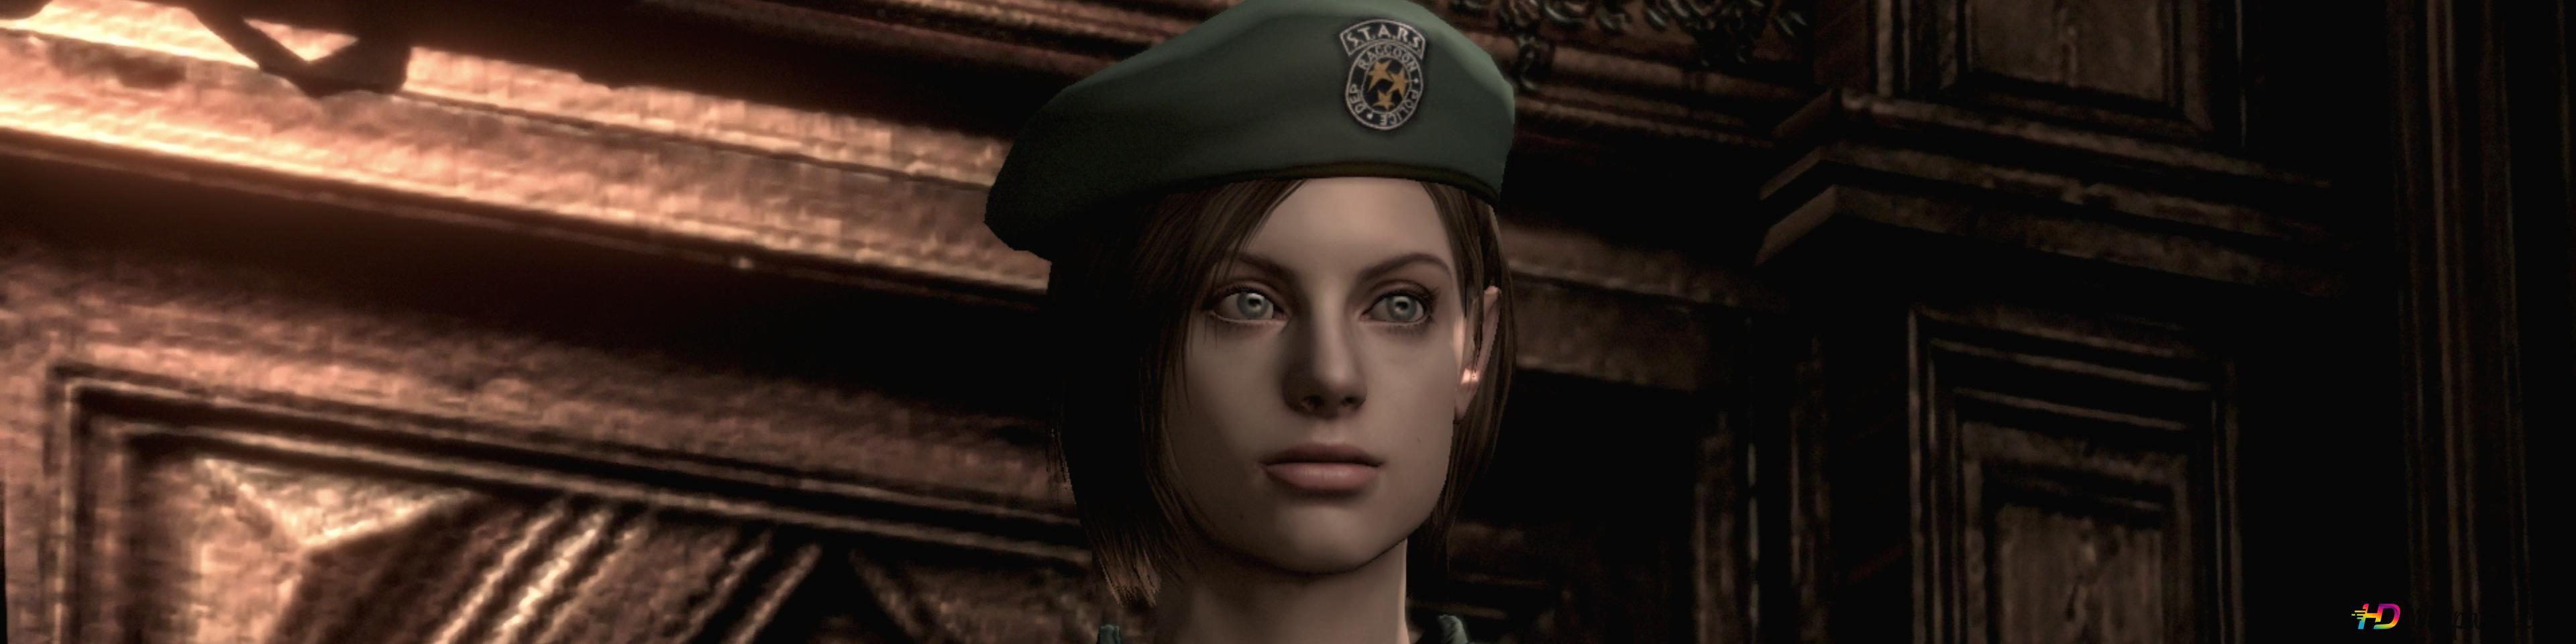 Jill Valentine Of Resident Evil Hd Wallpaper Download